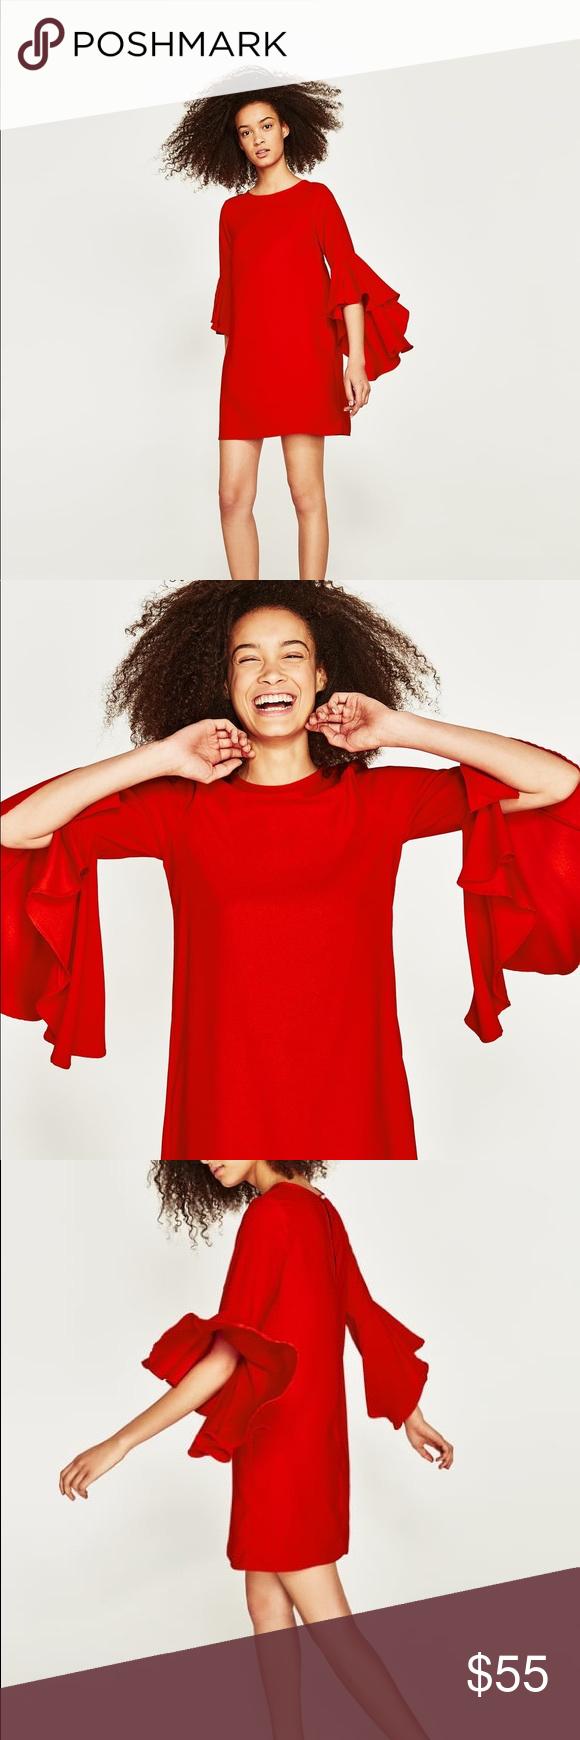 Nwt zara red ruffle bell sleeve mini dress zara dresses mini